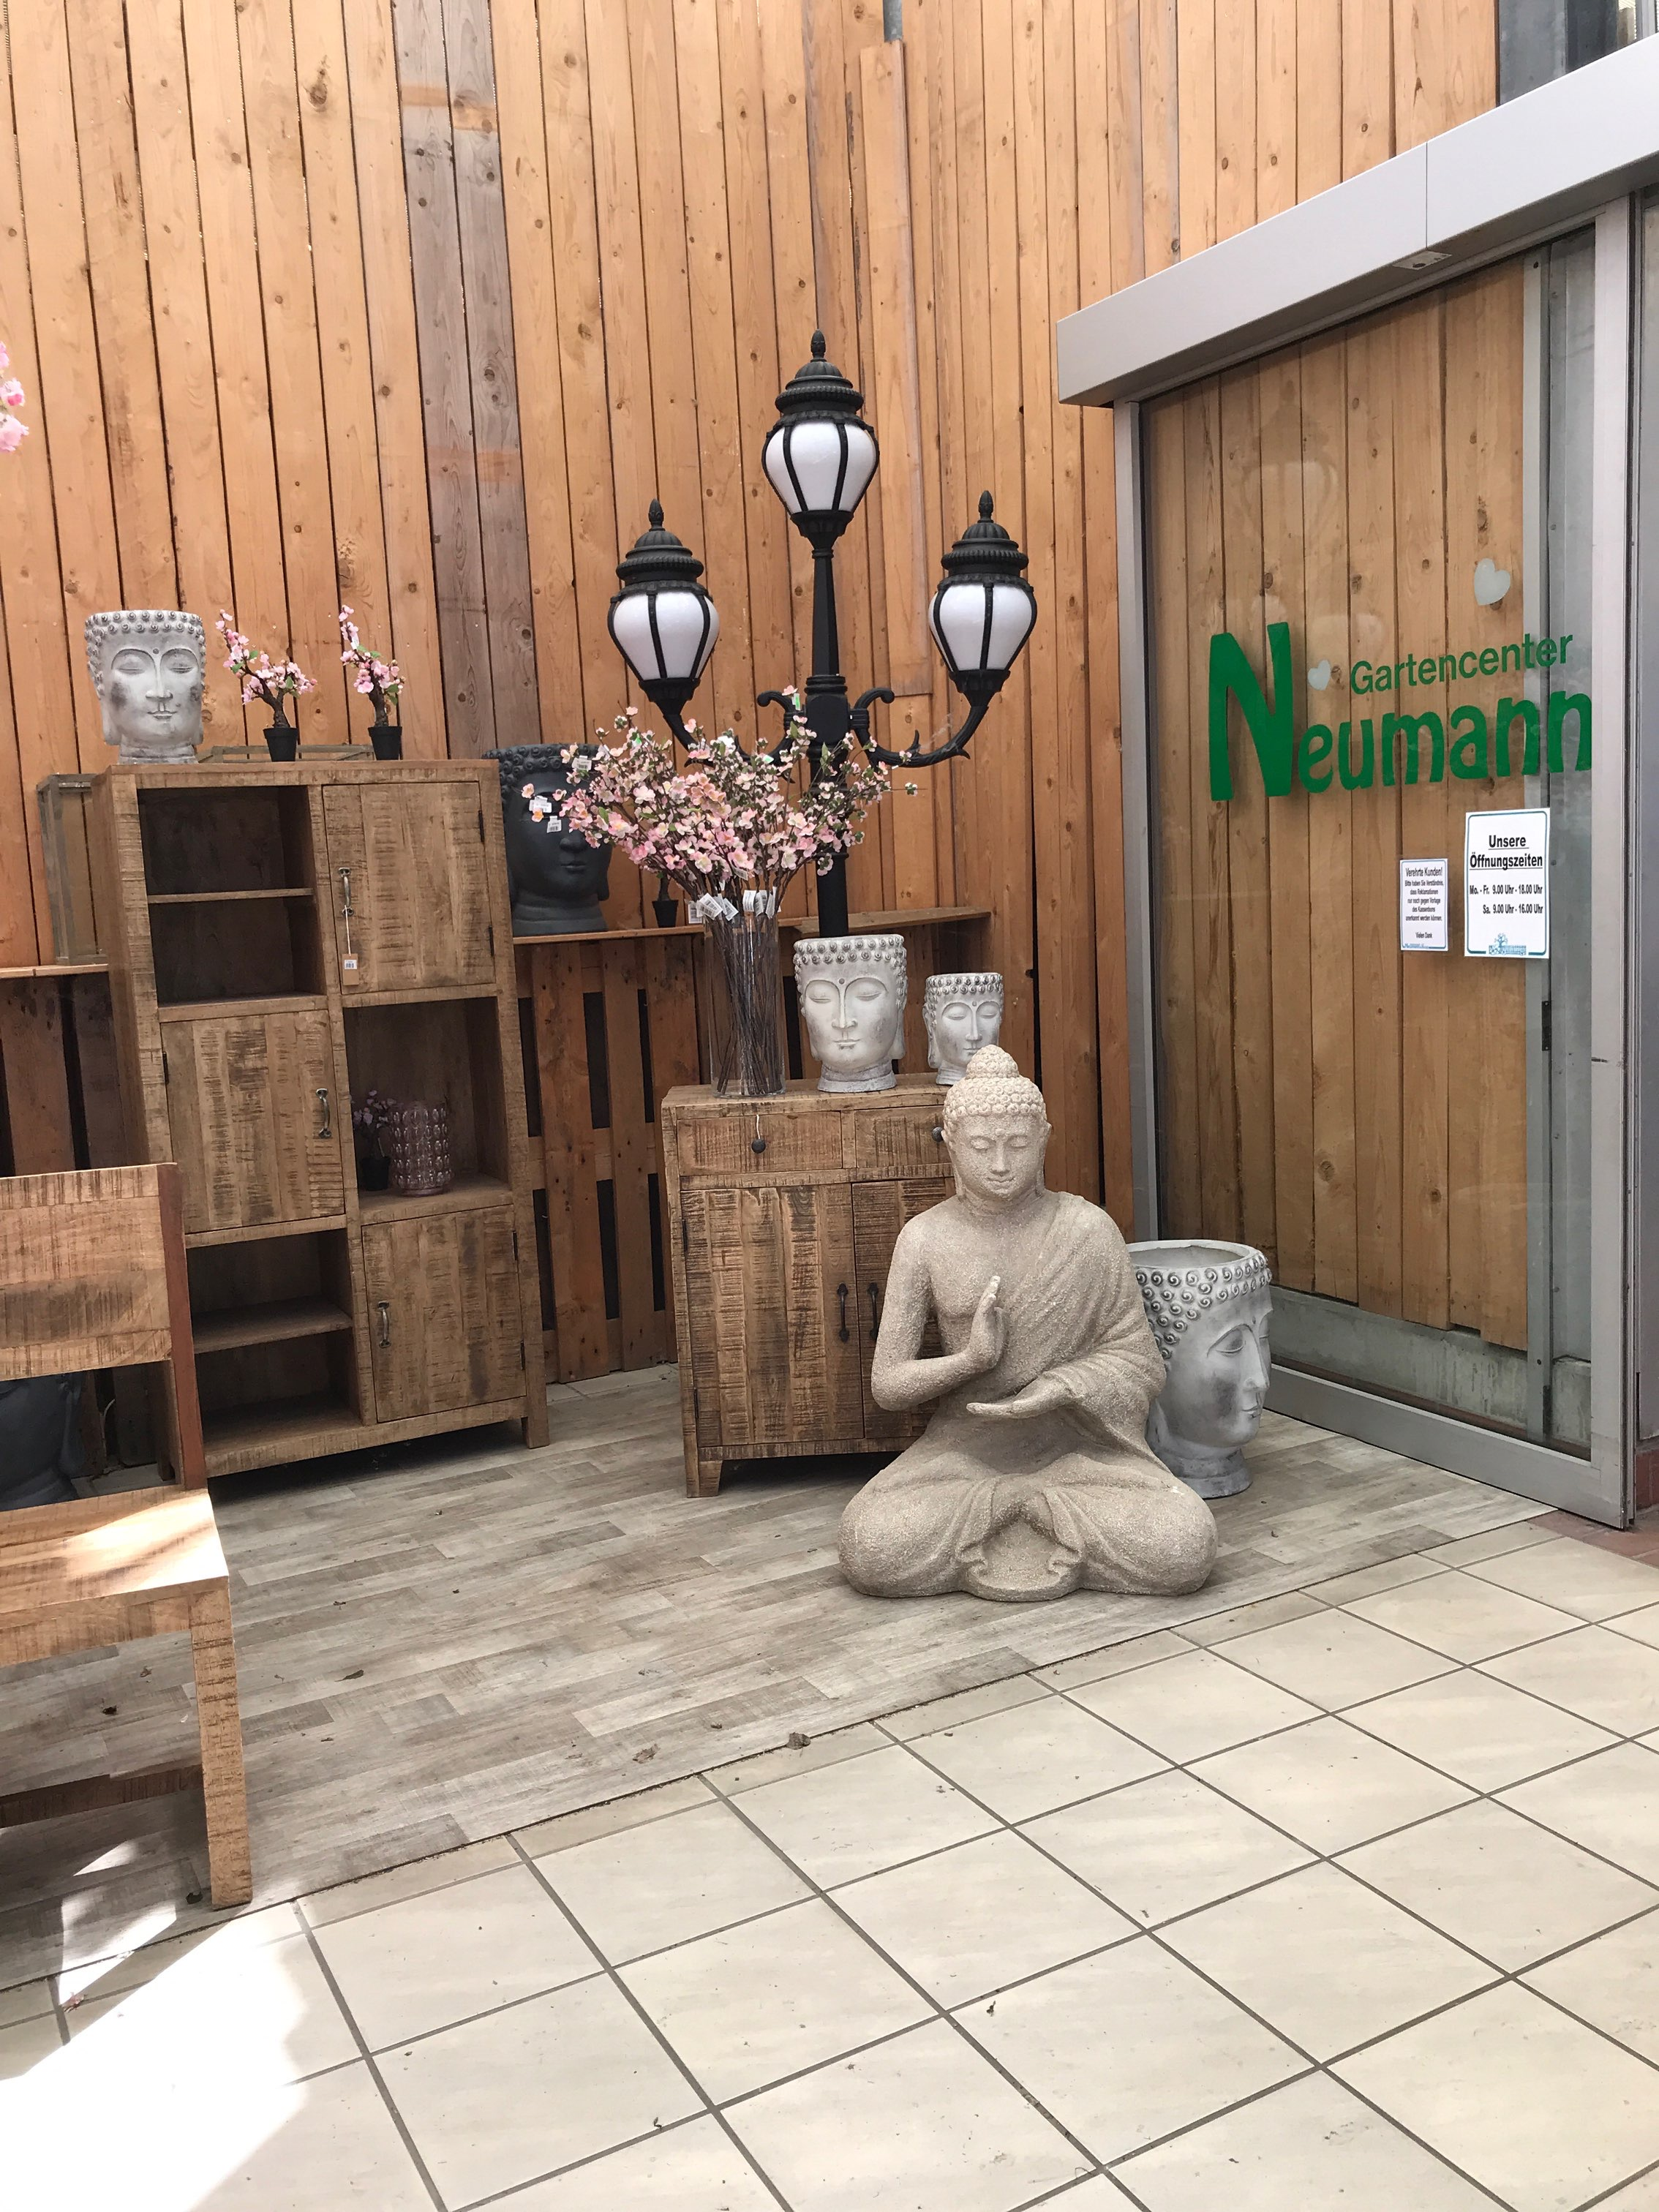 Gartencenter Neumann Gmbh 31785 Hameln Gewerbegebiet Sud Offnungszeiten Adresse Telefon